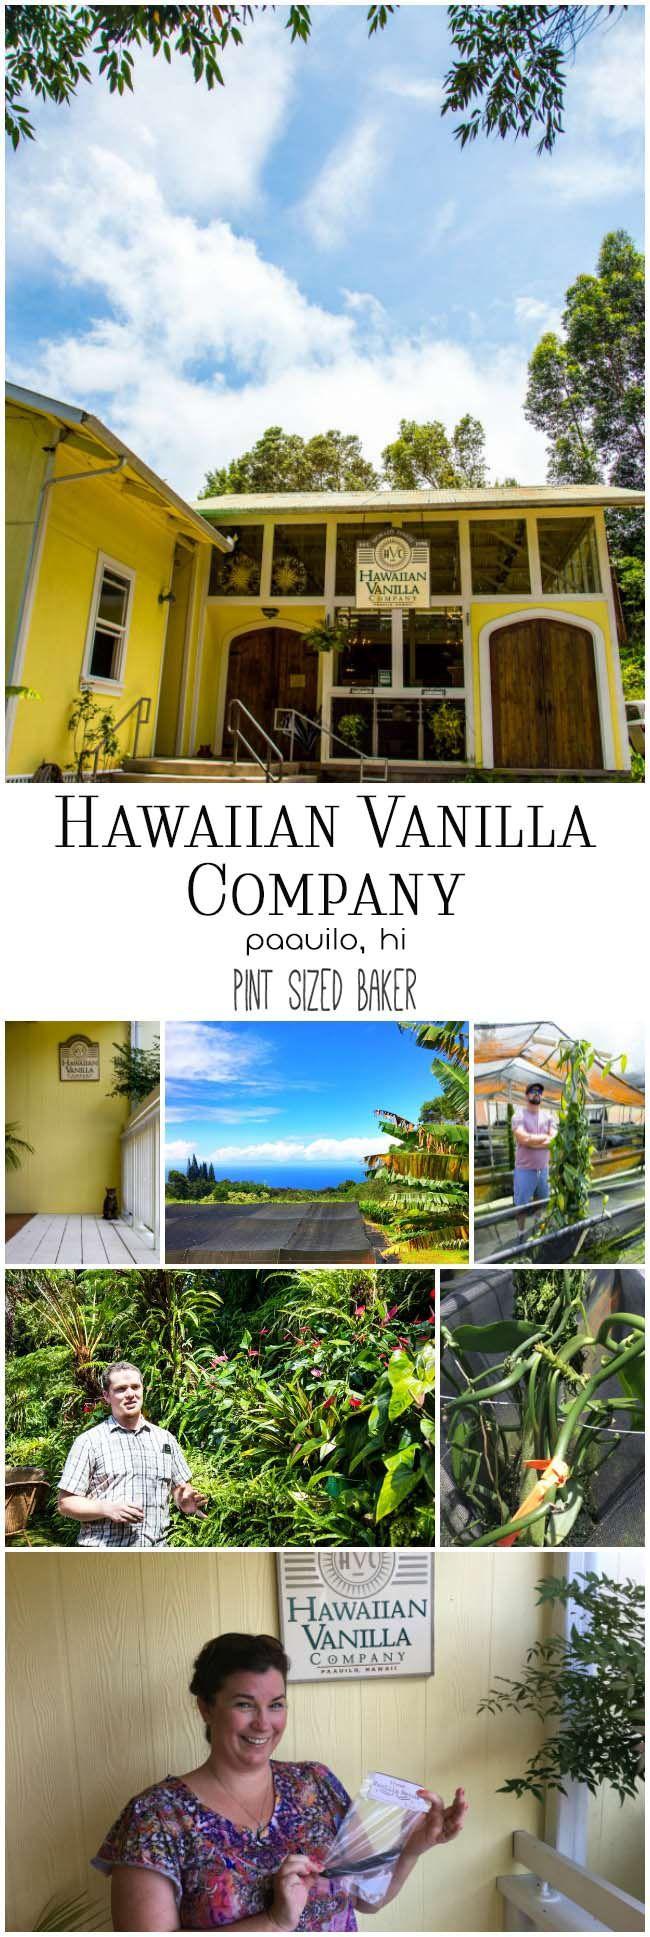 178 besten bildern zu kailua kona auf pinterest